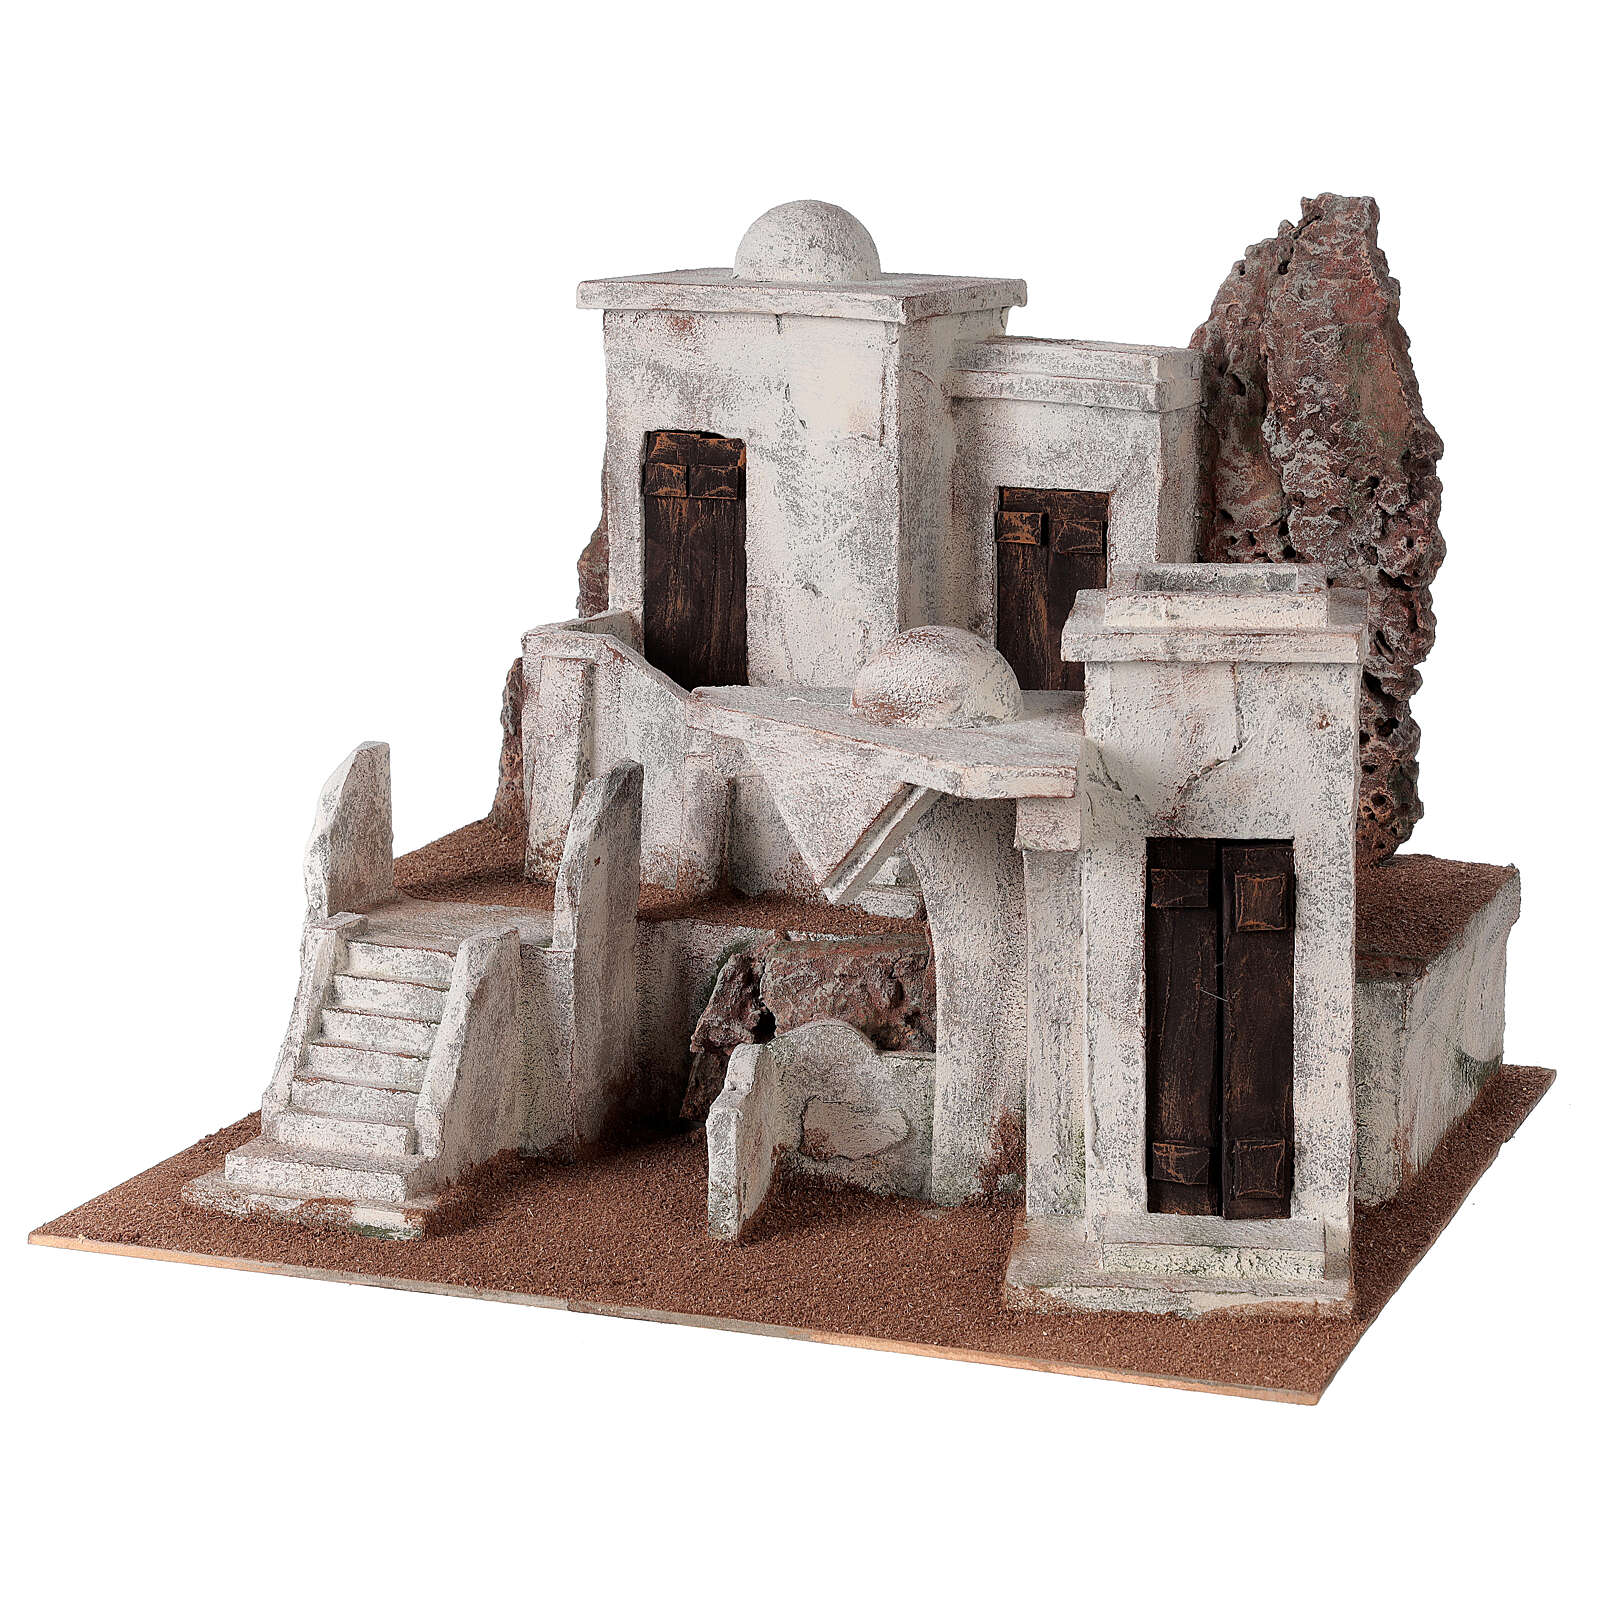 Borgo arabo presepe storico 34x45x38 cm per statue 12 cm 4